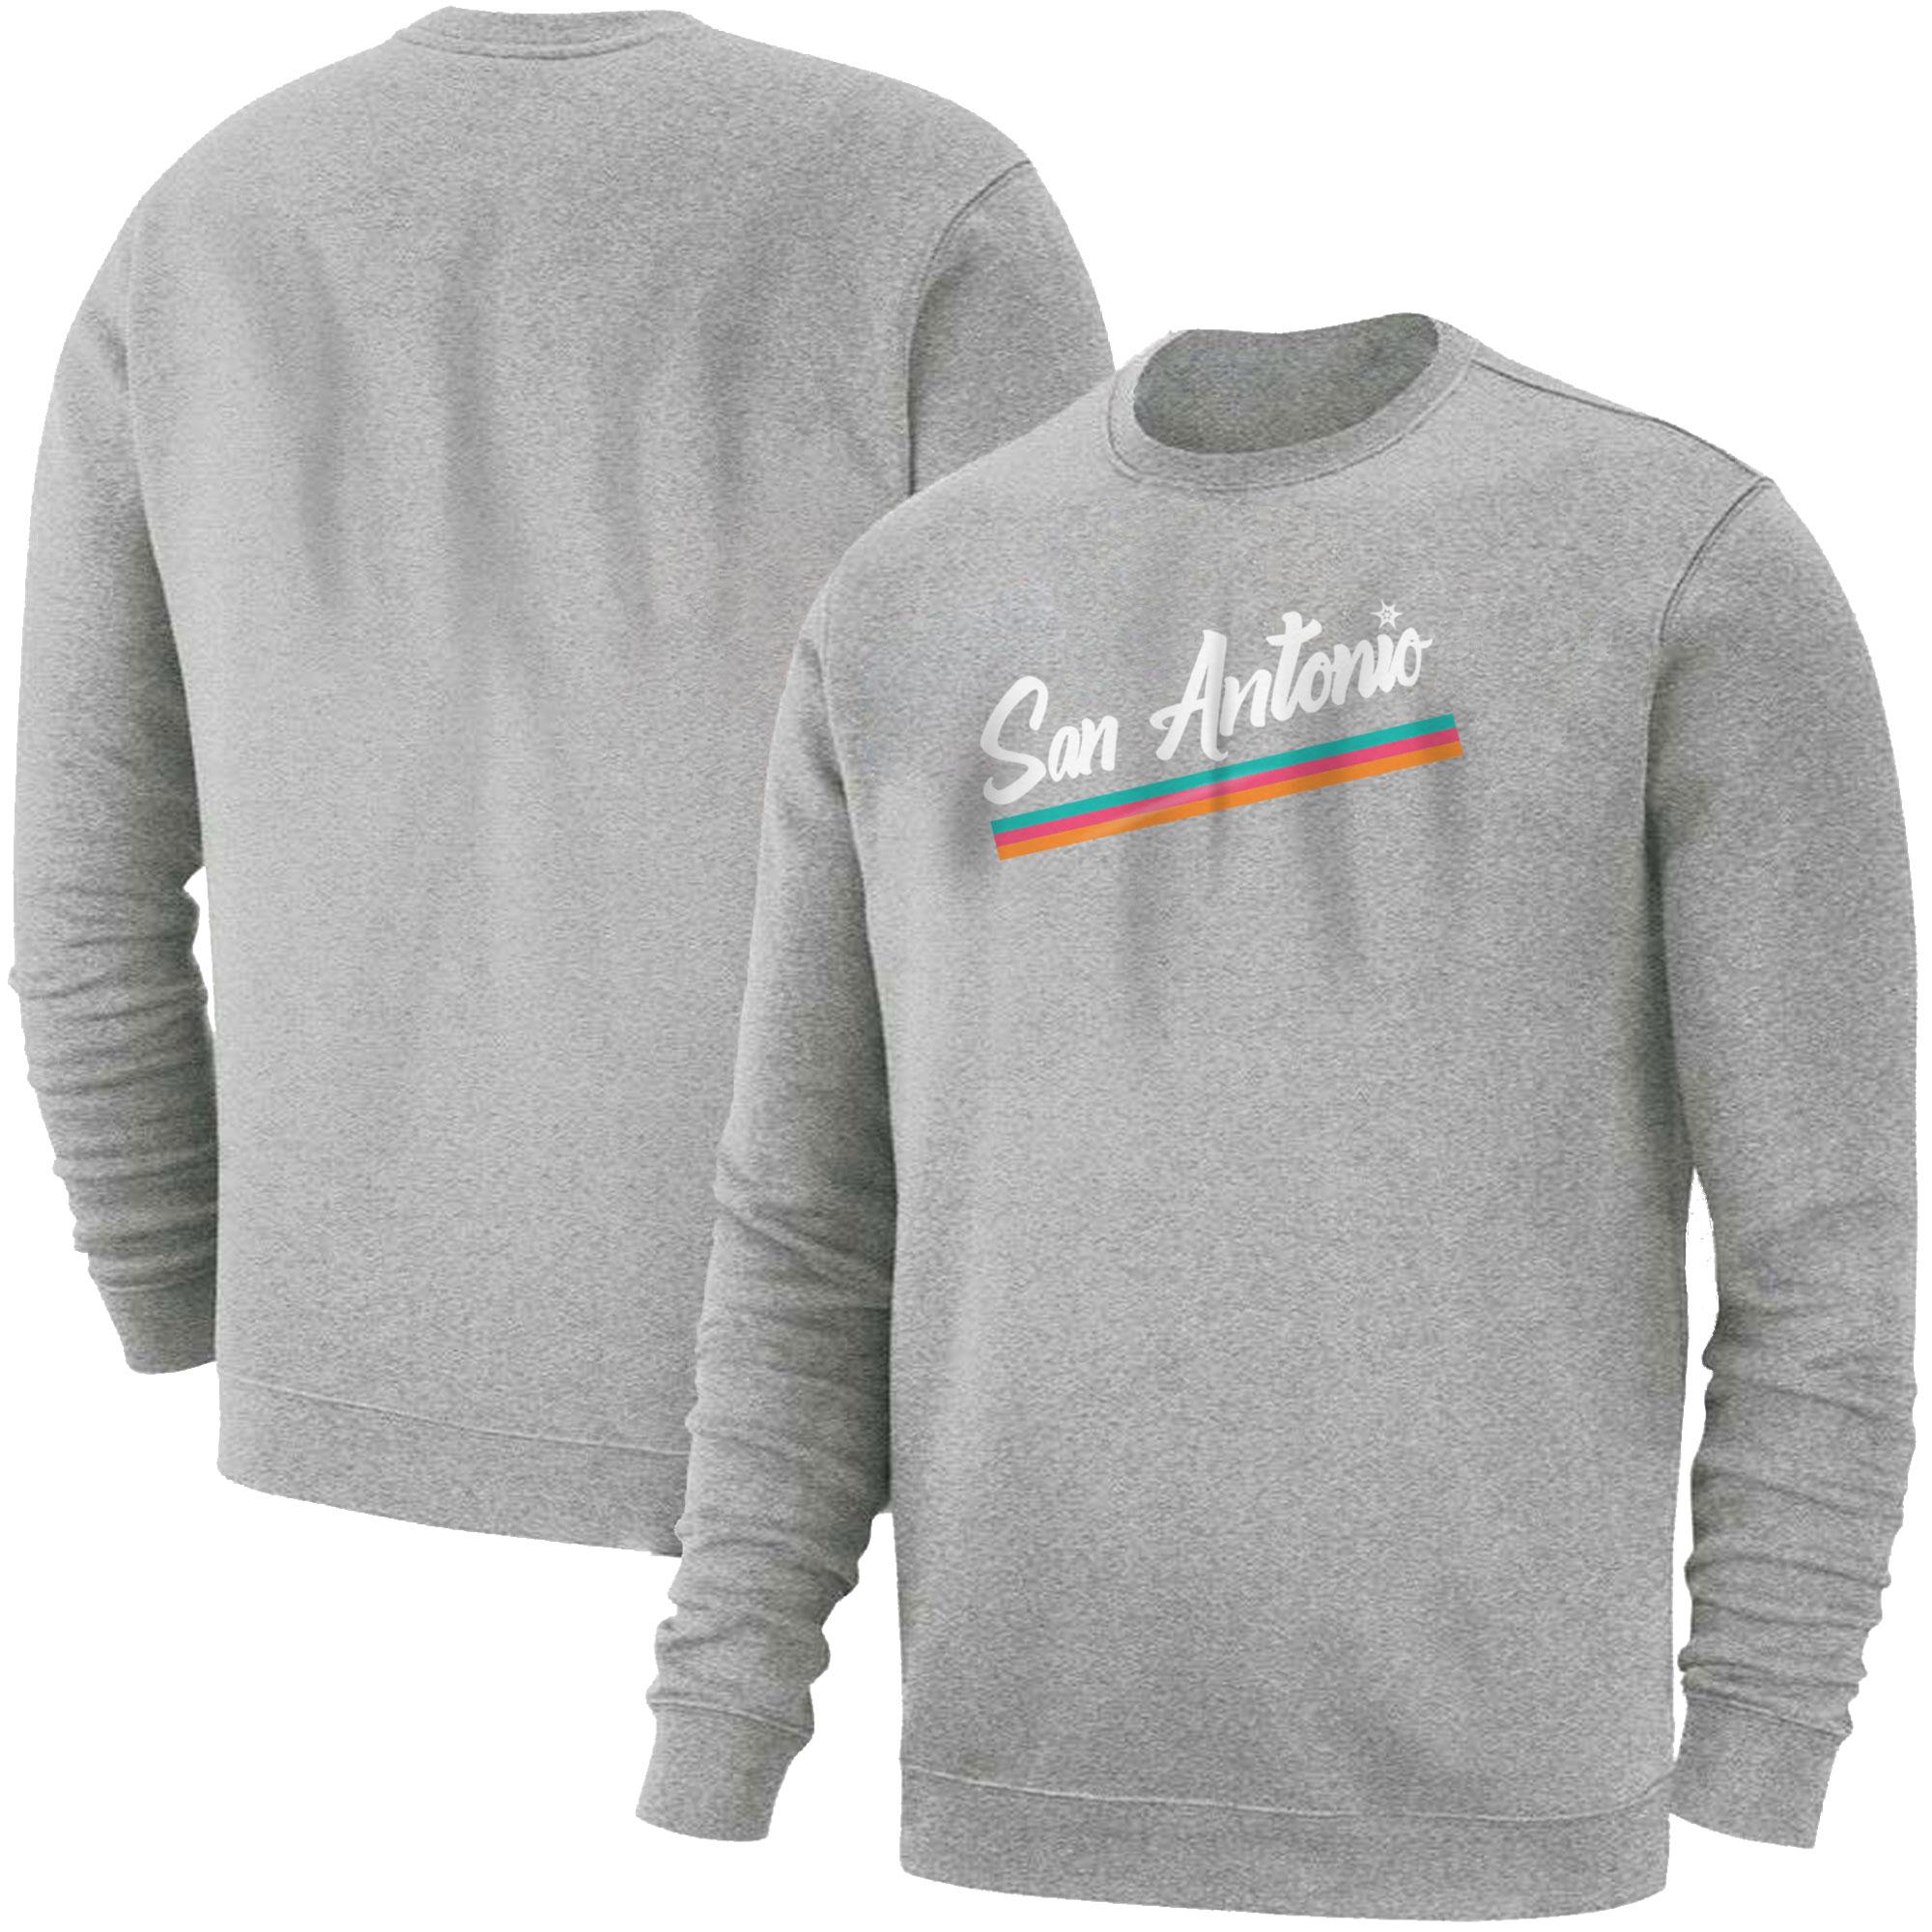 San Antonio Spurs Basic (BSC-GRY-496-NBA-SAS)